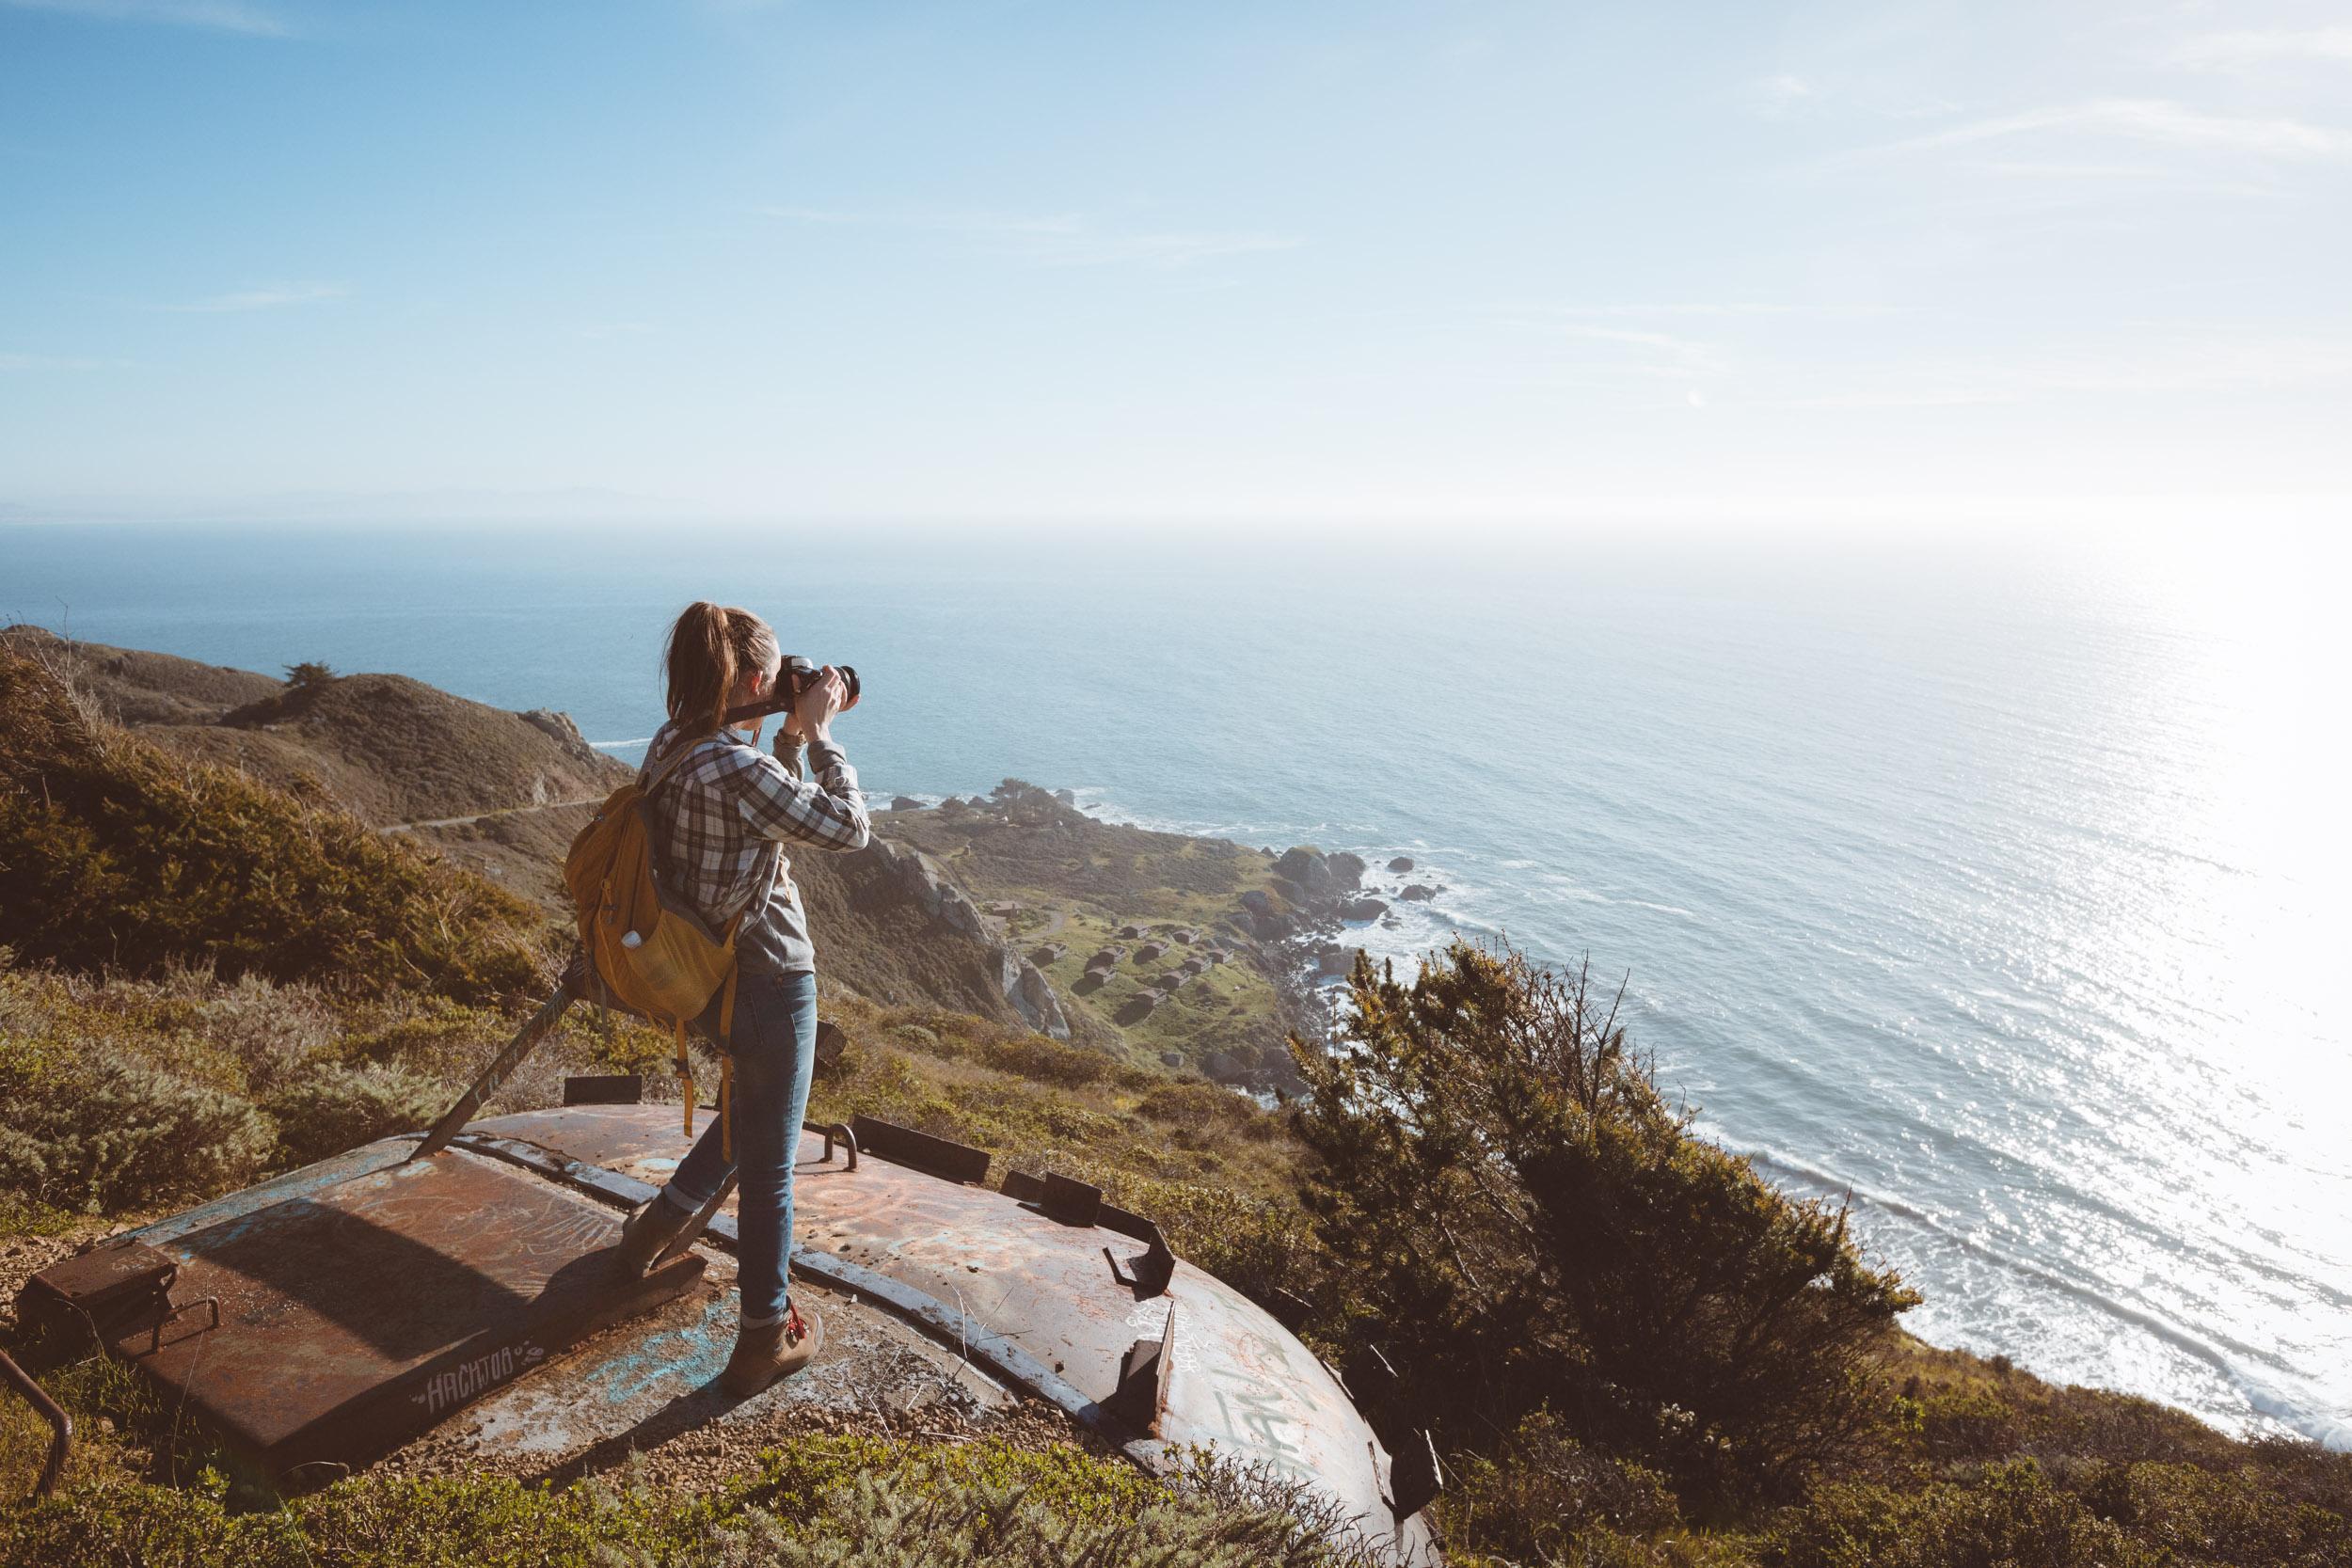 stinson-beach-vista-hike-and-shoot-1.jpg